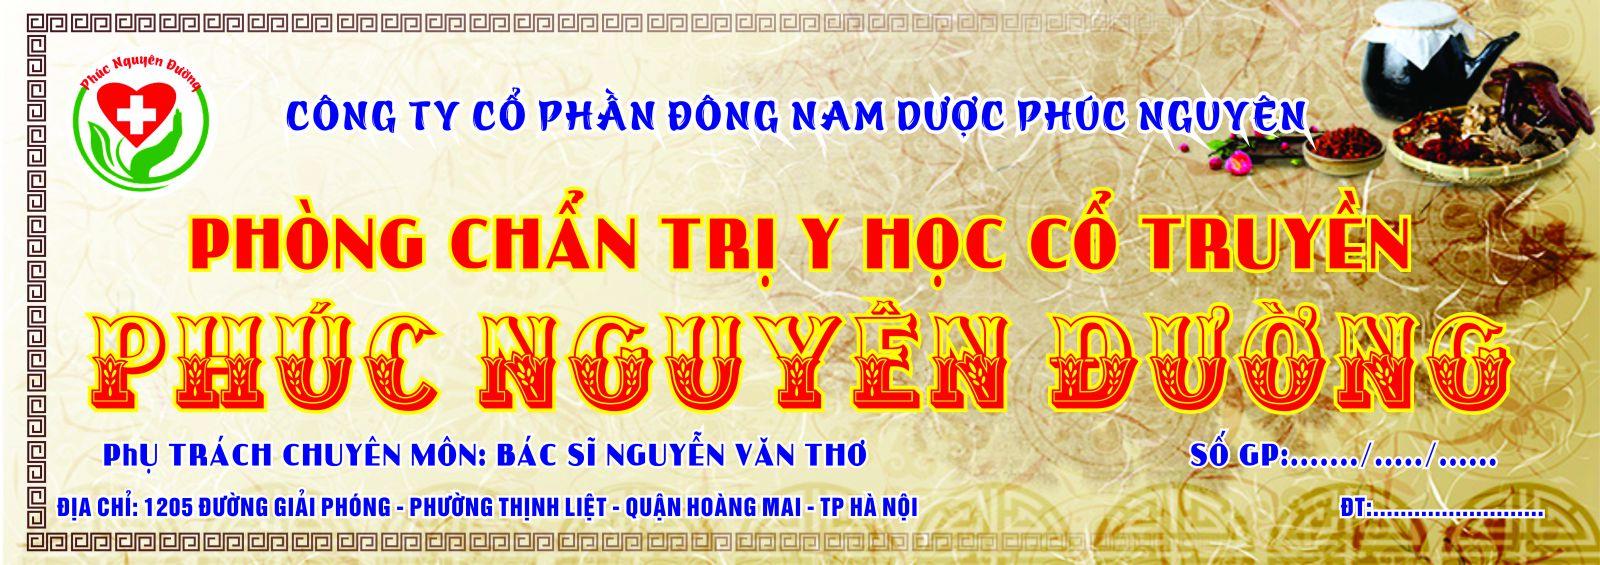 http://rohaumon.com.vn/admin/